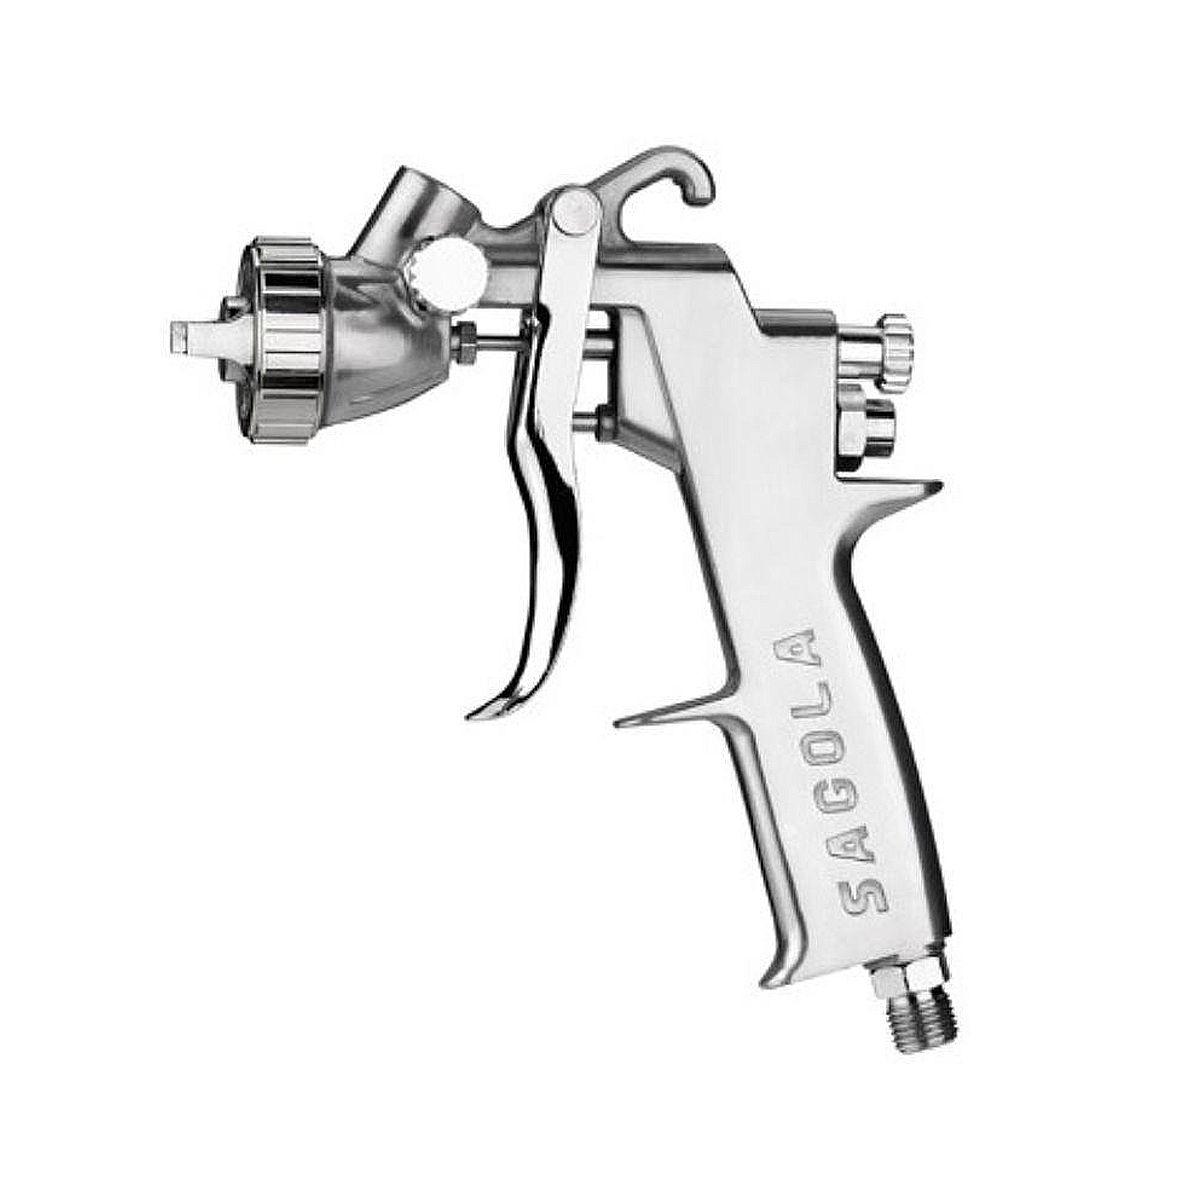 Pistola de Gravidade Junior G 1.8 Sagola